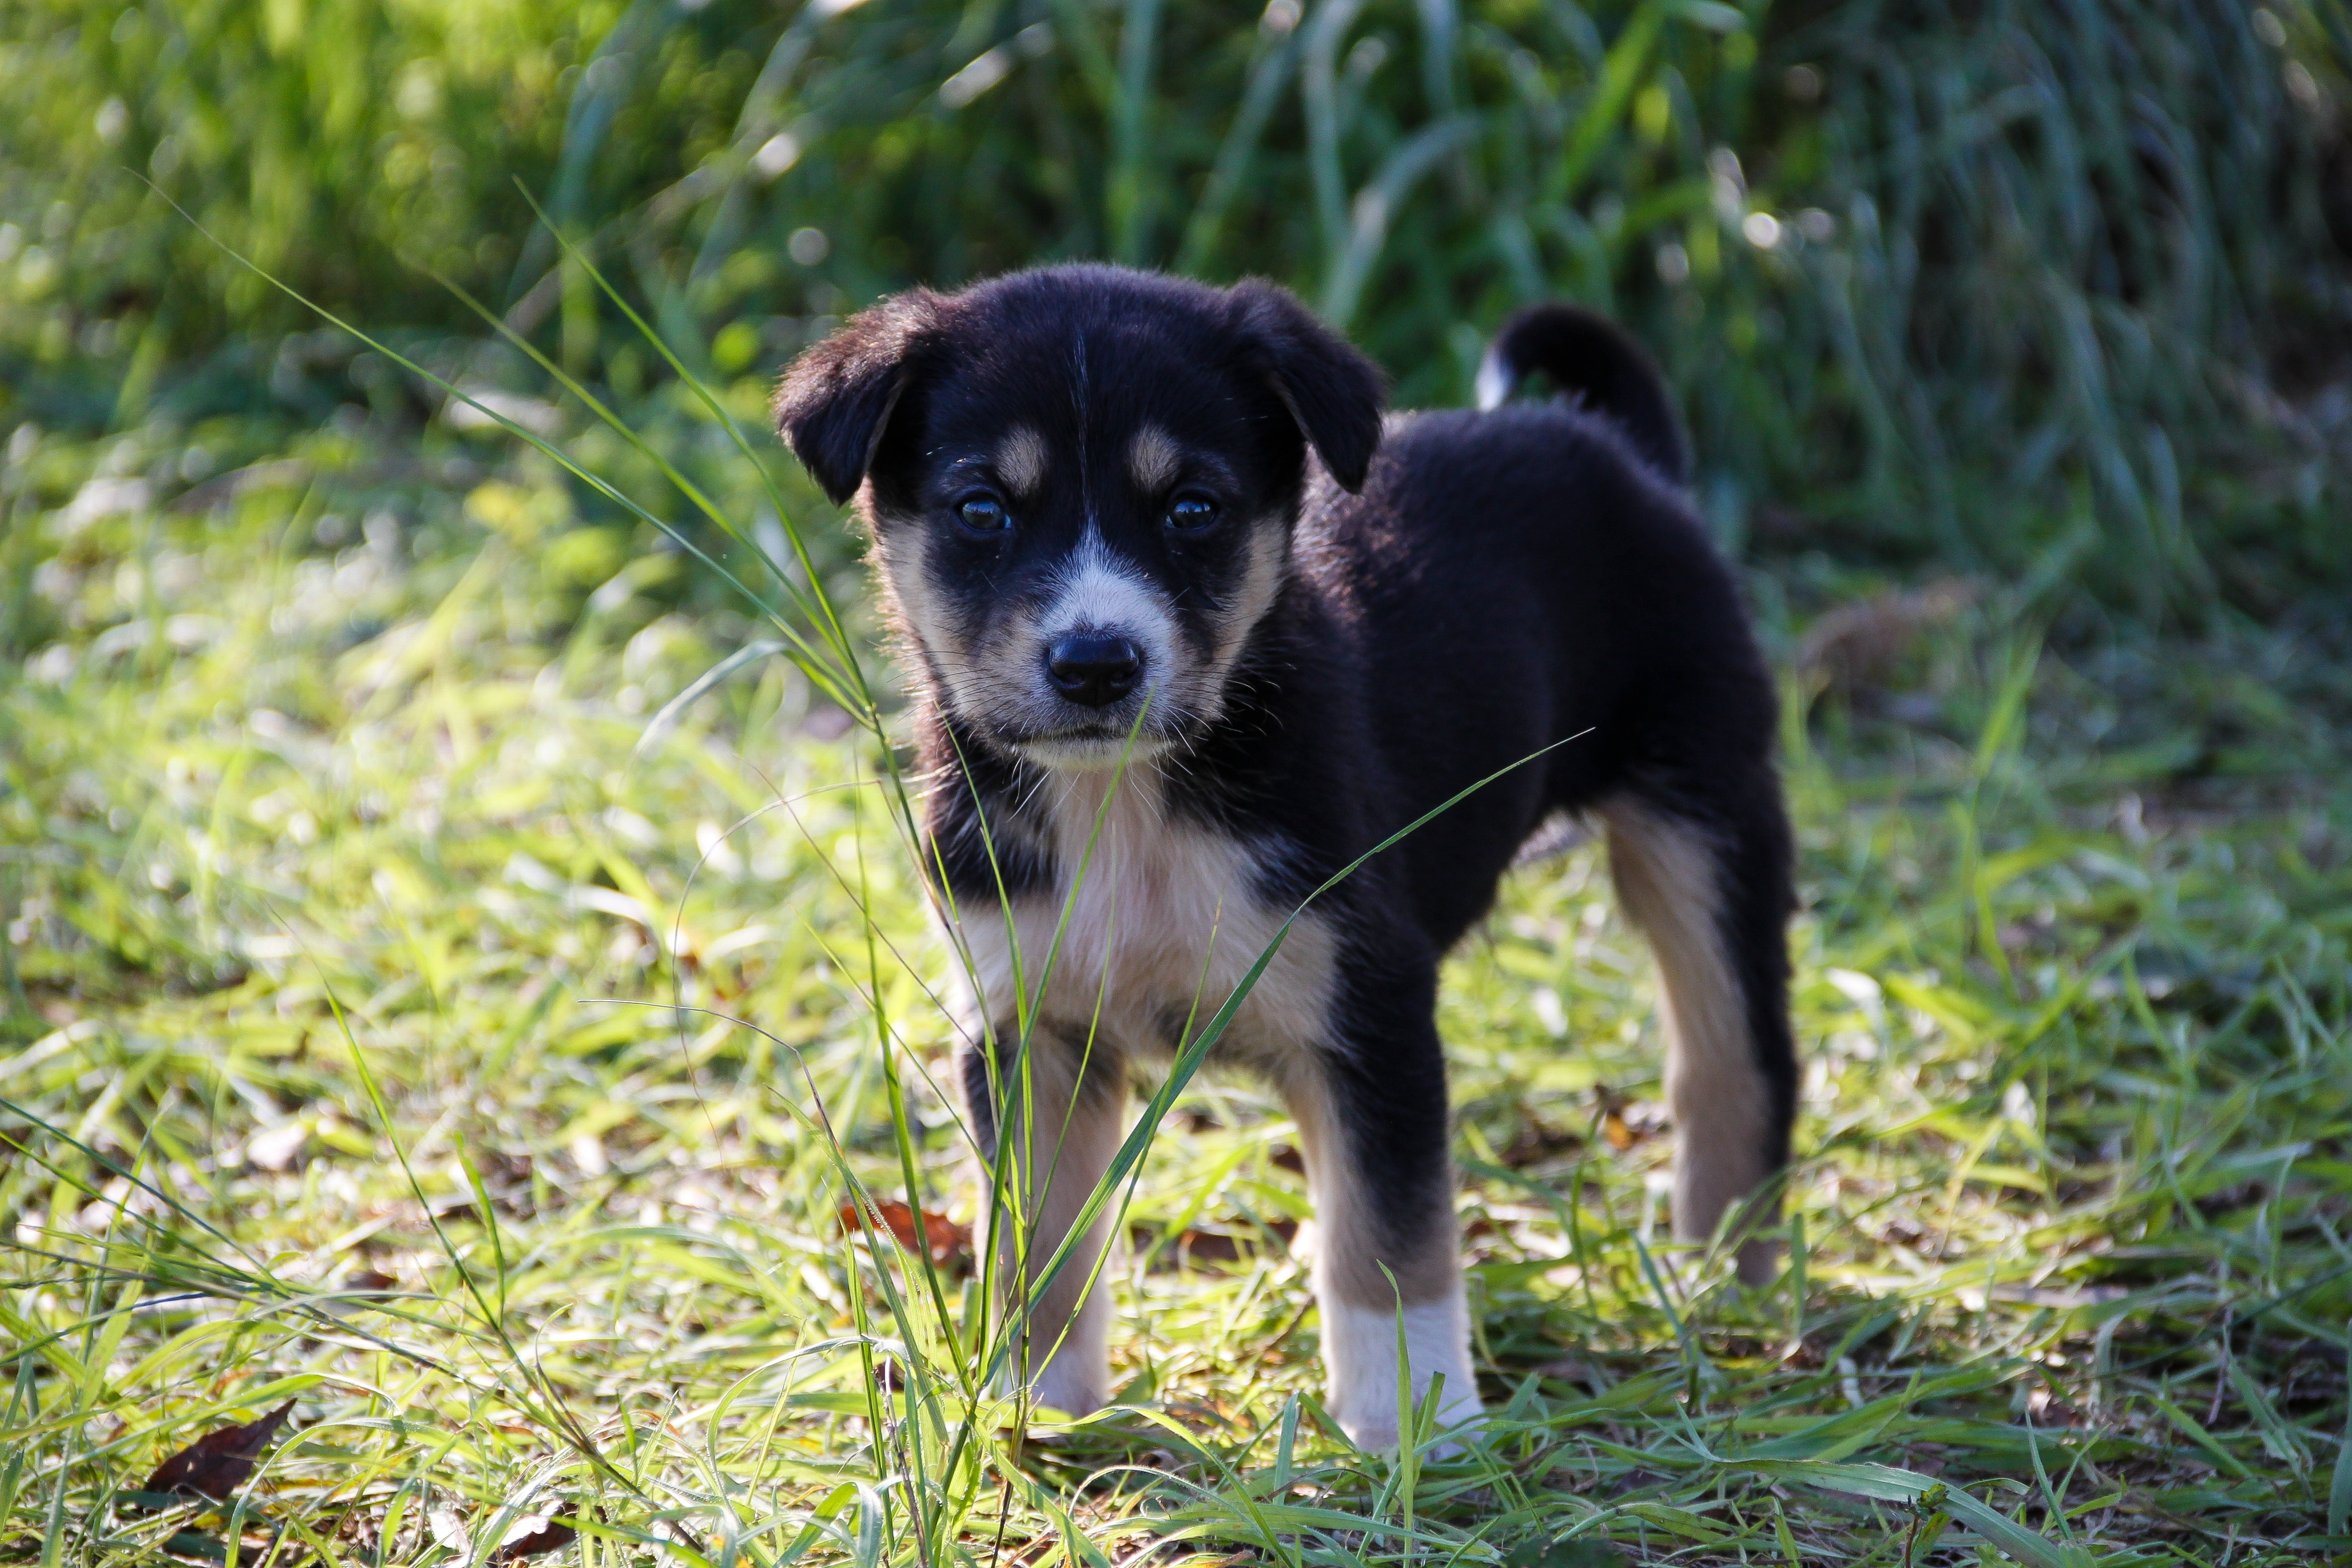 Dog on grass photo